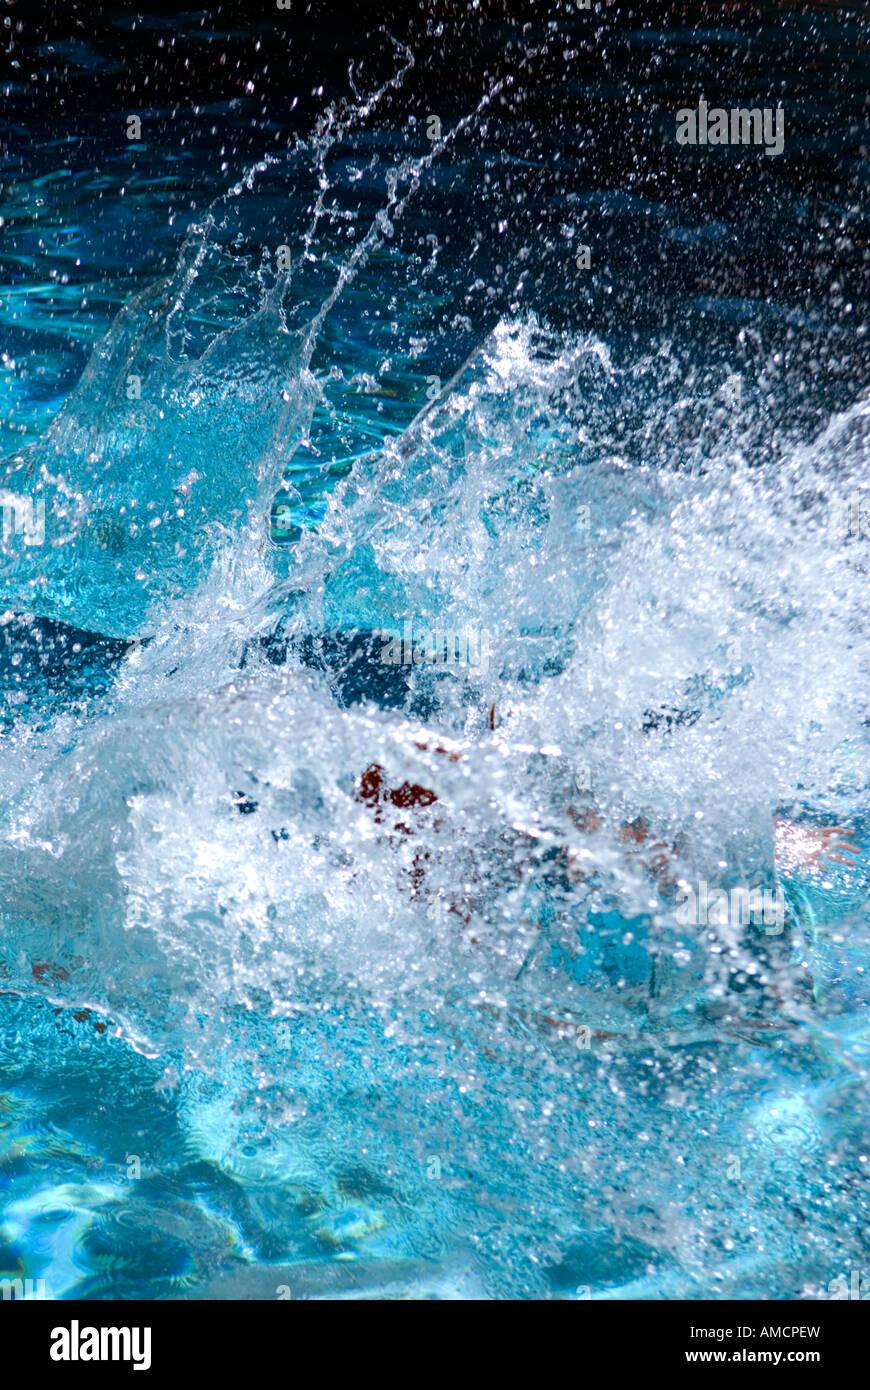 Action Freeze Frame Stockfotos & Action Freeze Frame Bilder - Alamy